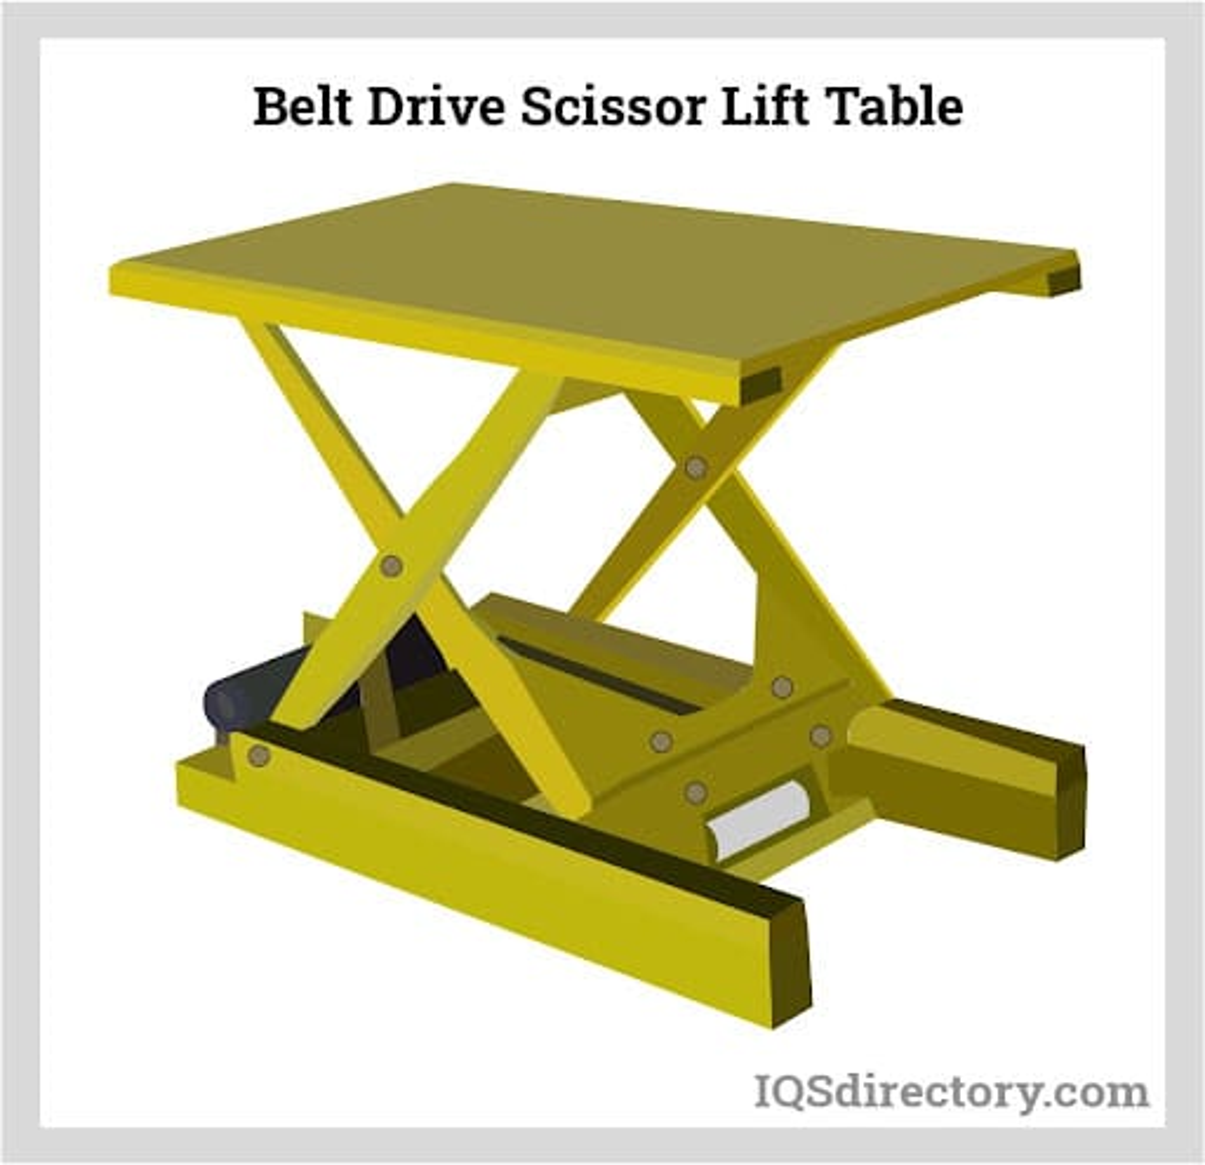 Belt Drive Scissor Lift Table